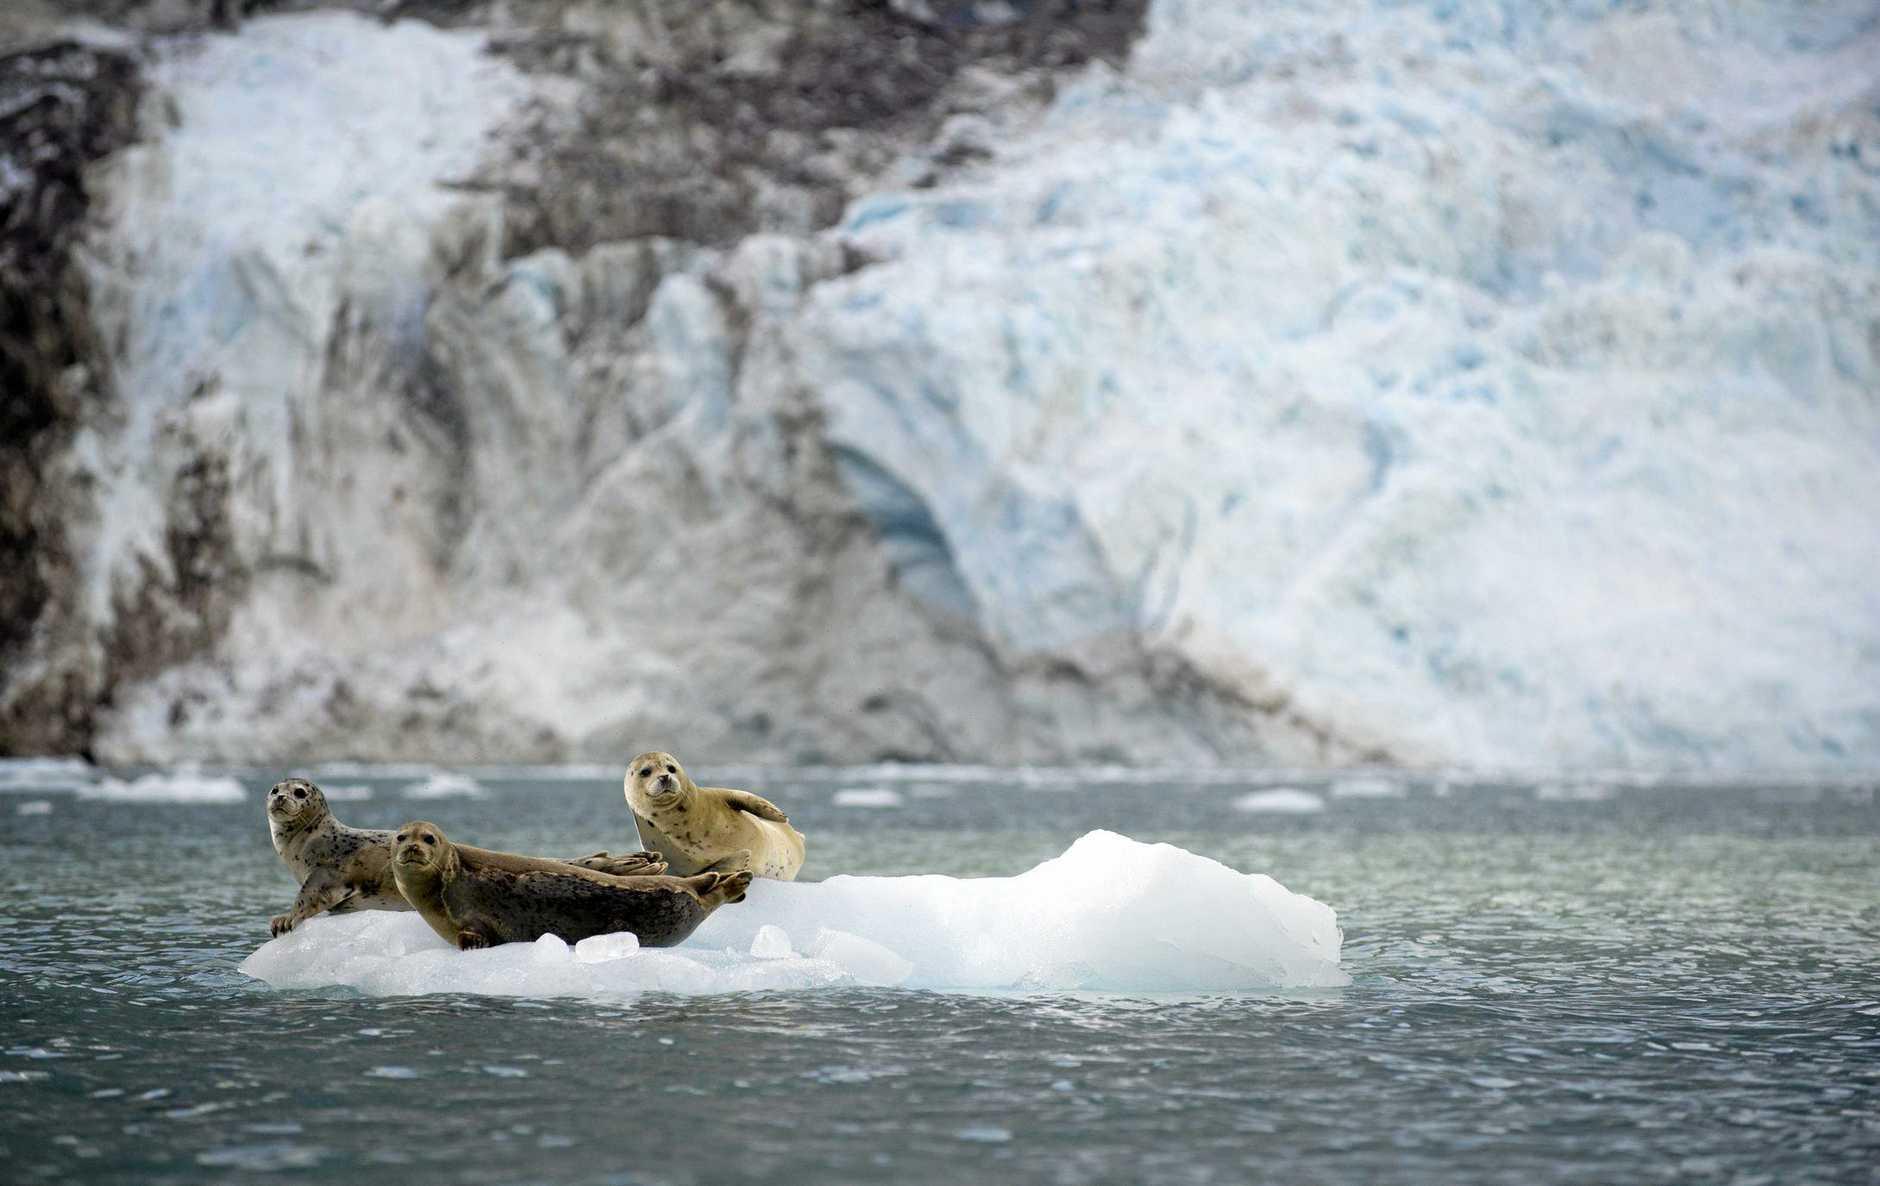 Seals rest on an ice floe in Alaska.